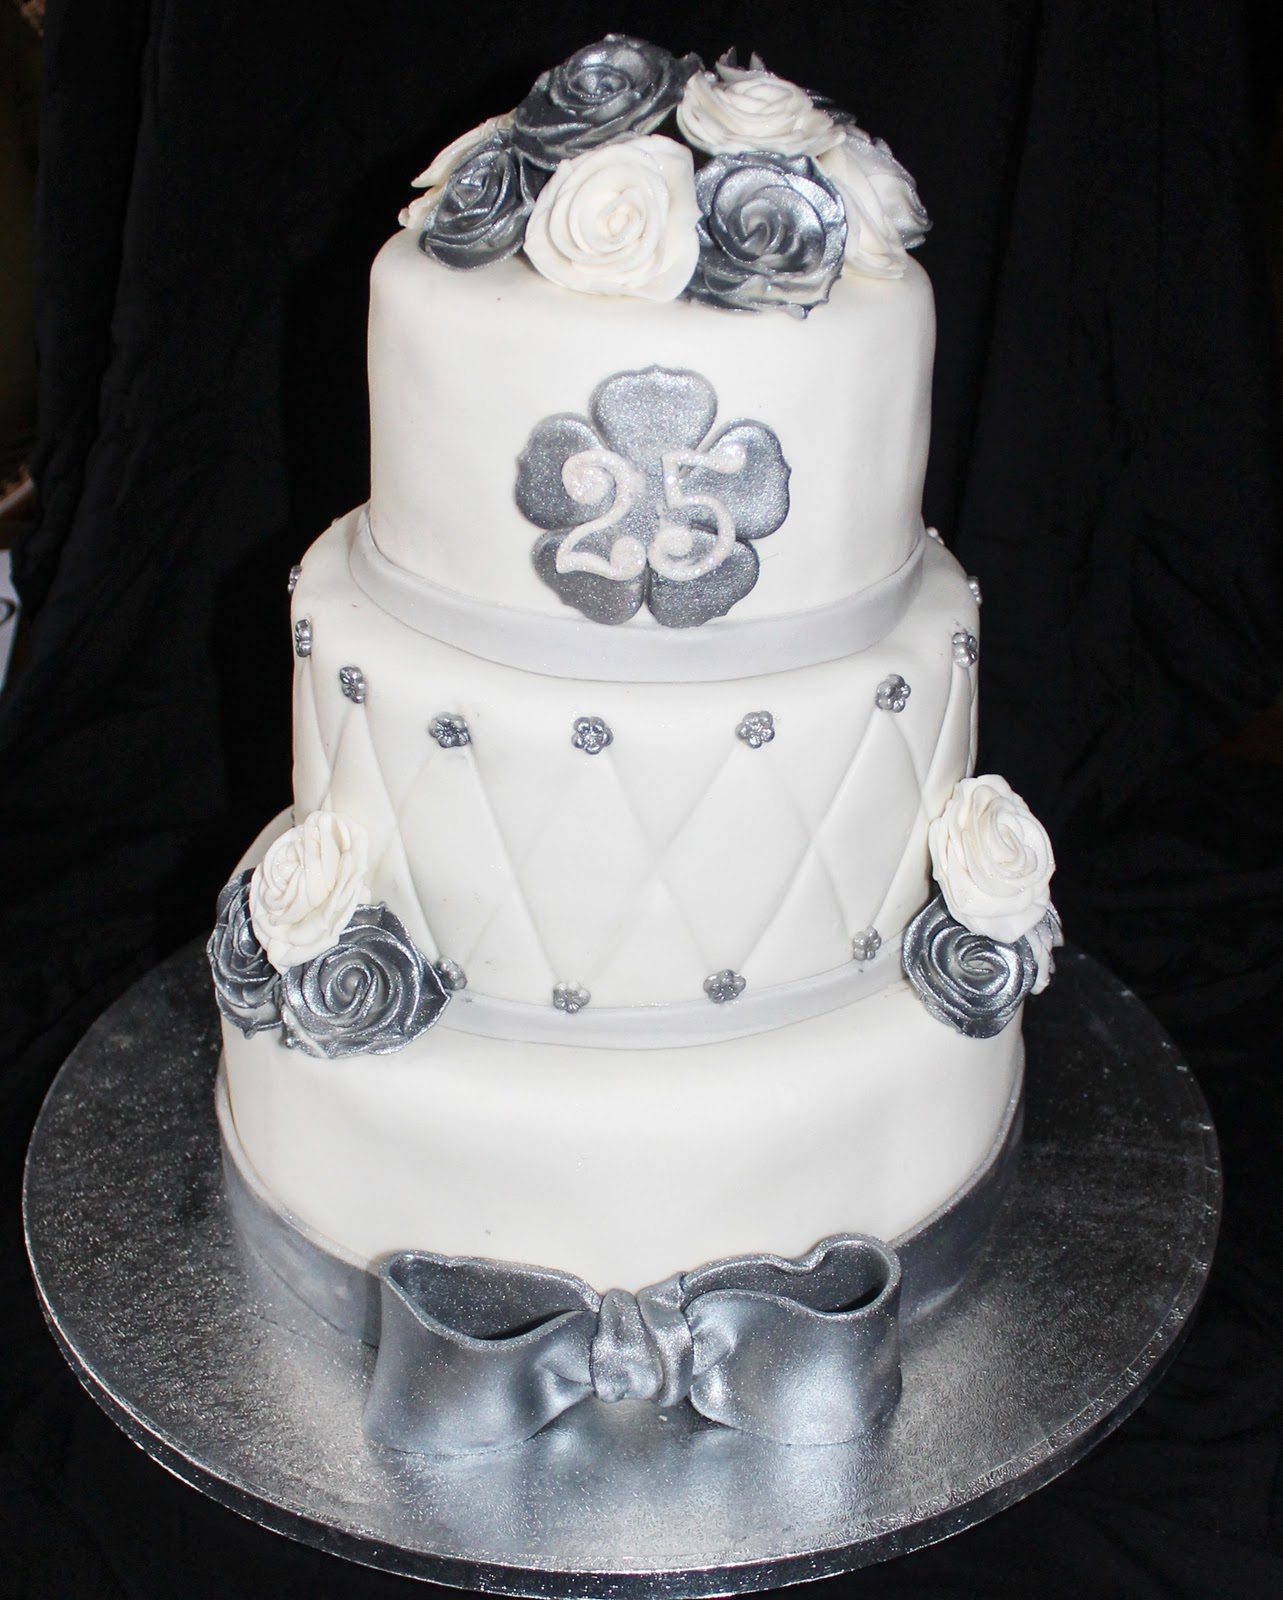 Las tartas de mj tarta bodas de plata - Decoracion para bodas de plata ...